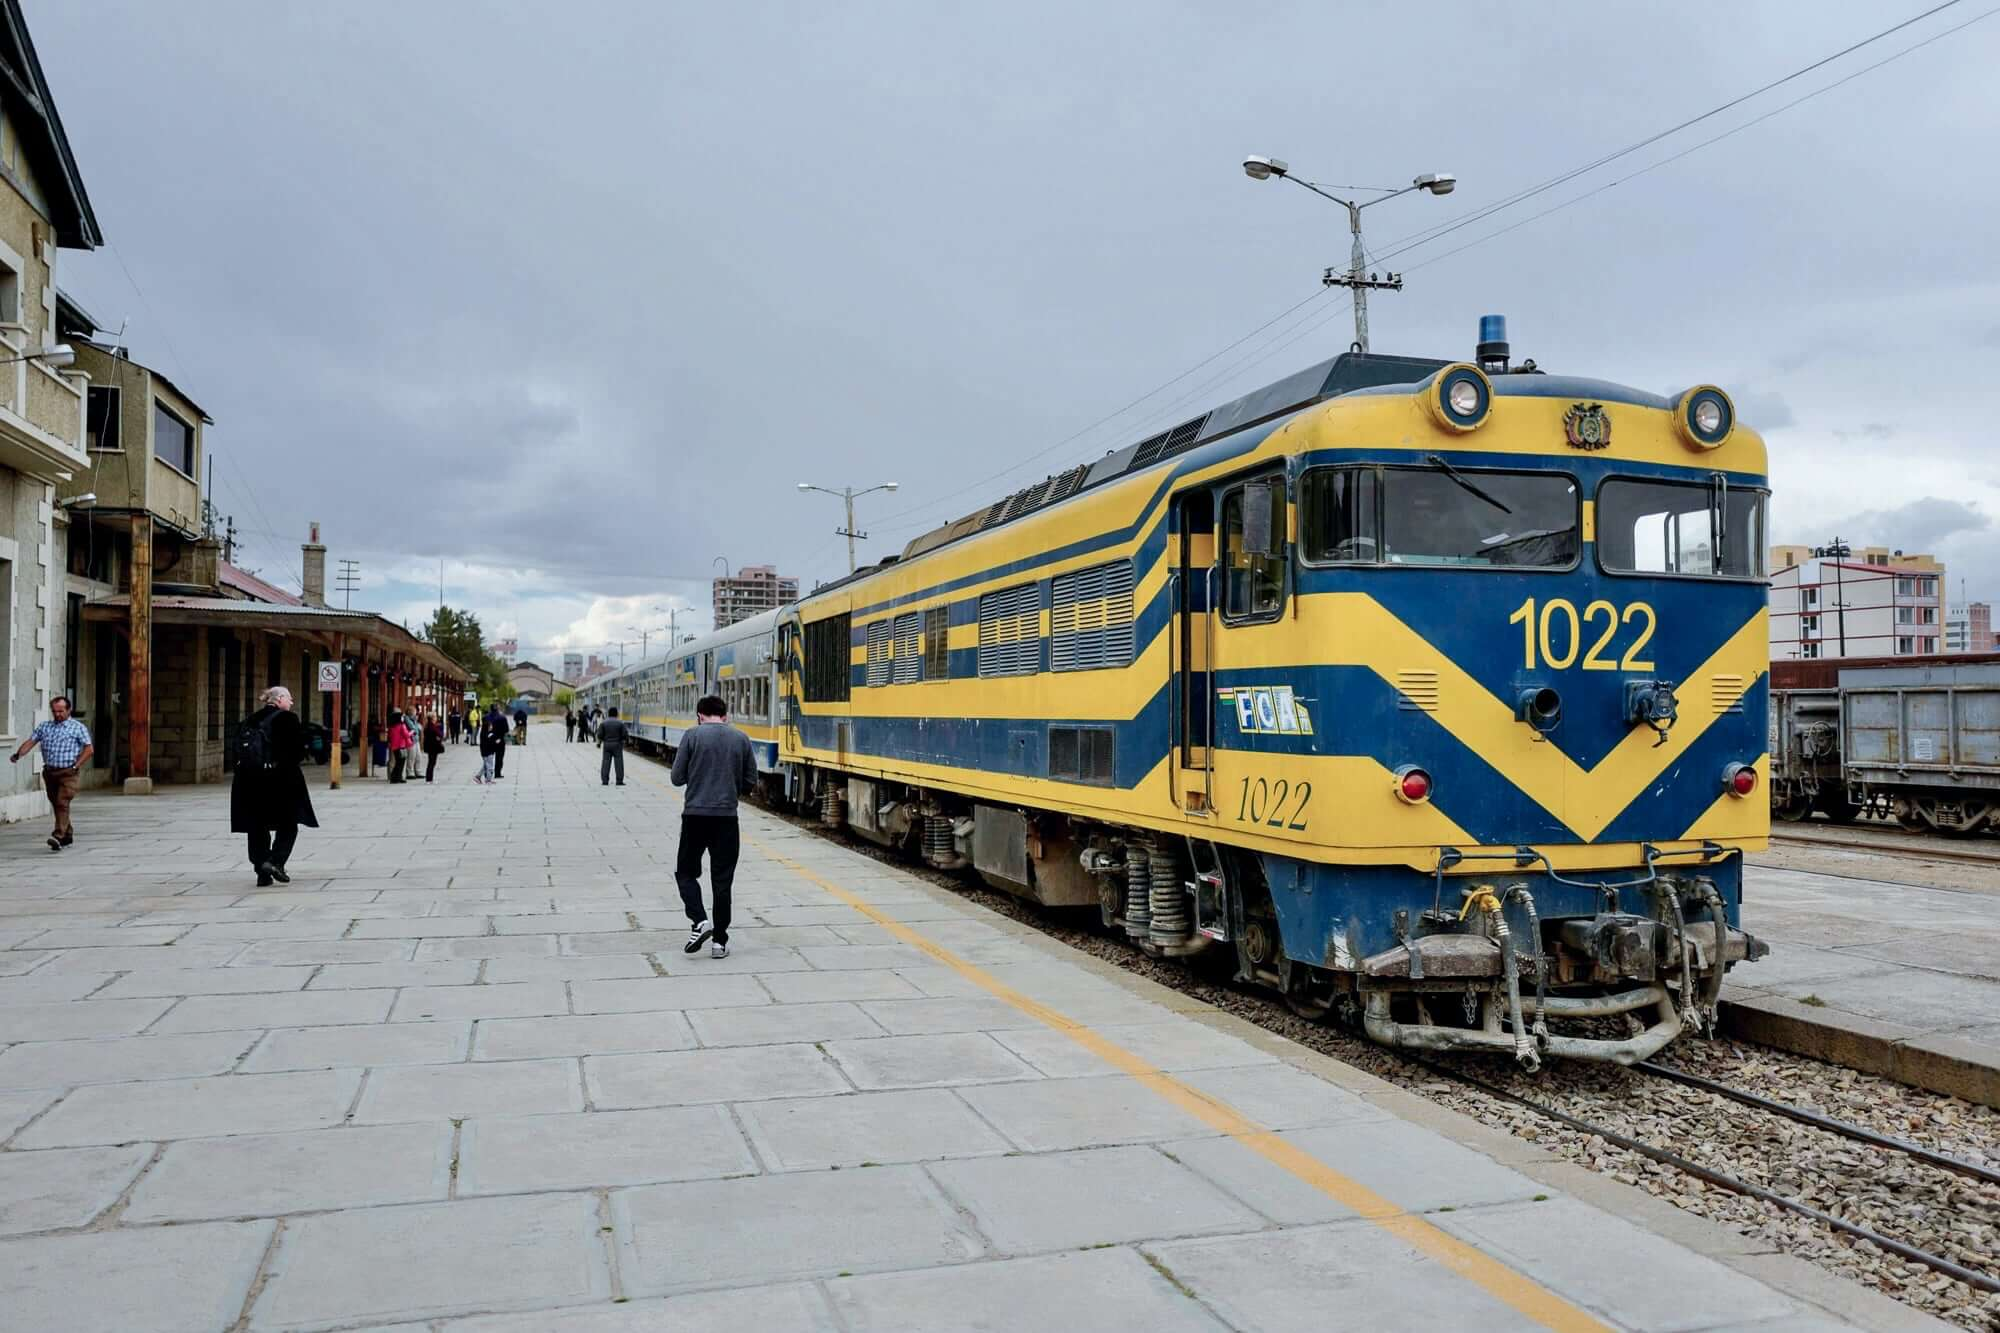 Expreso del Sur before departure at the Oruro Train Station, Bolivia